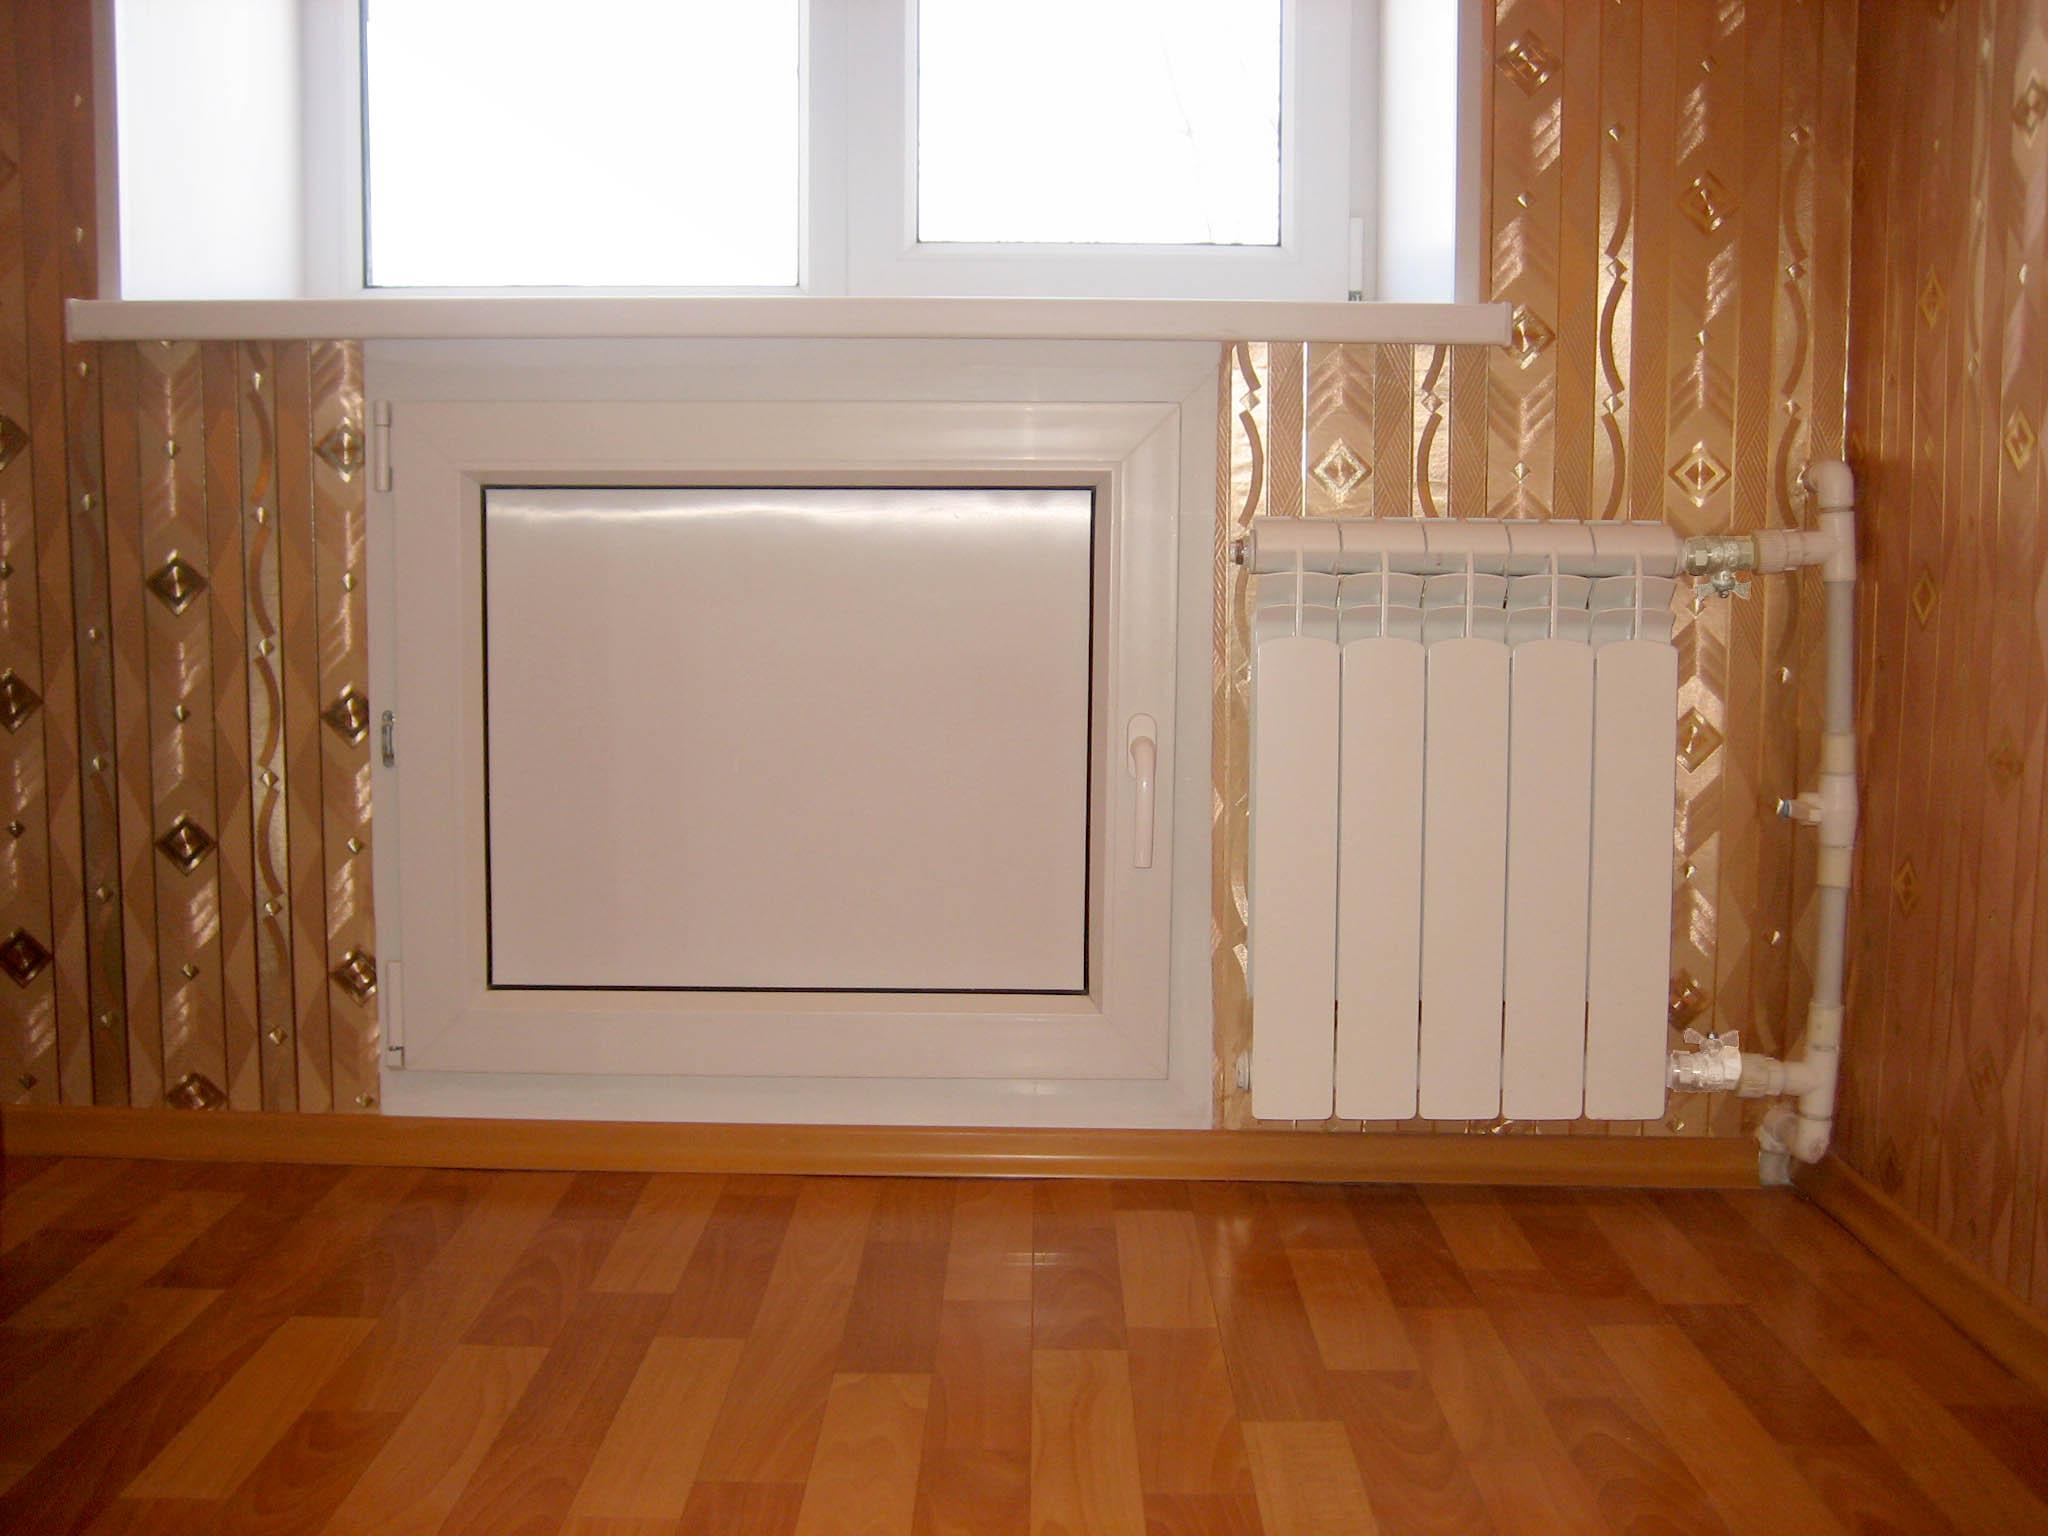 Холодильник под окном зимний